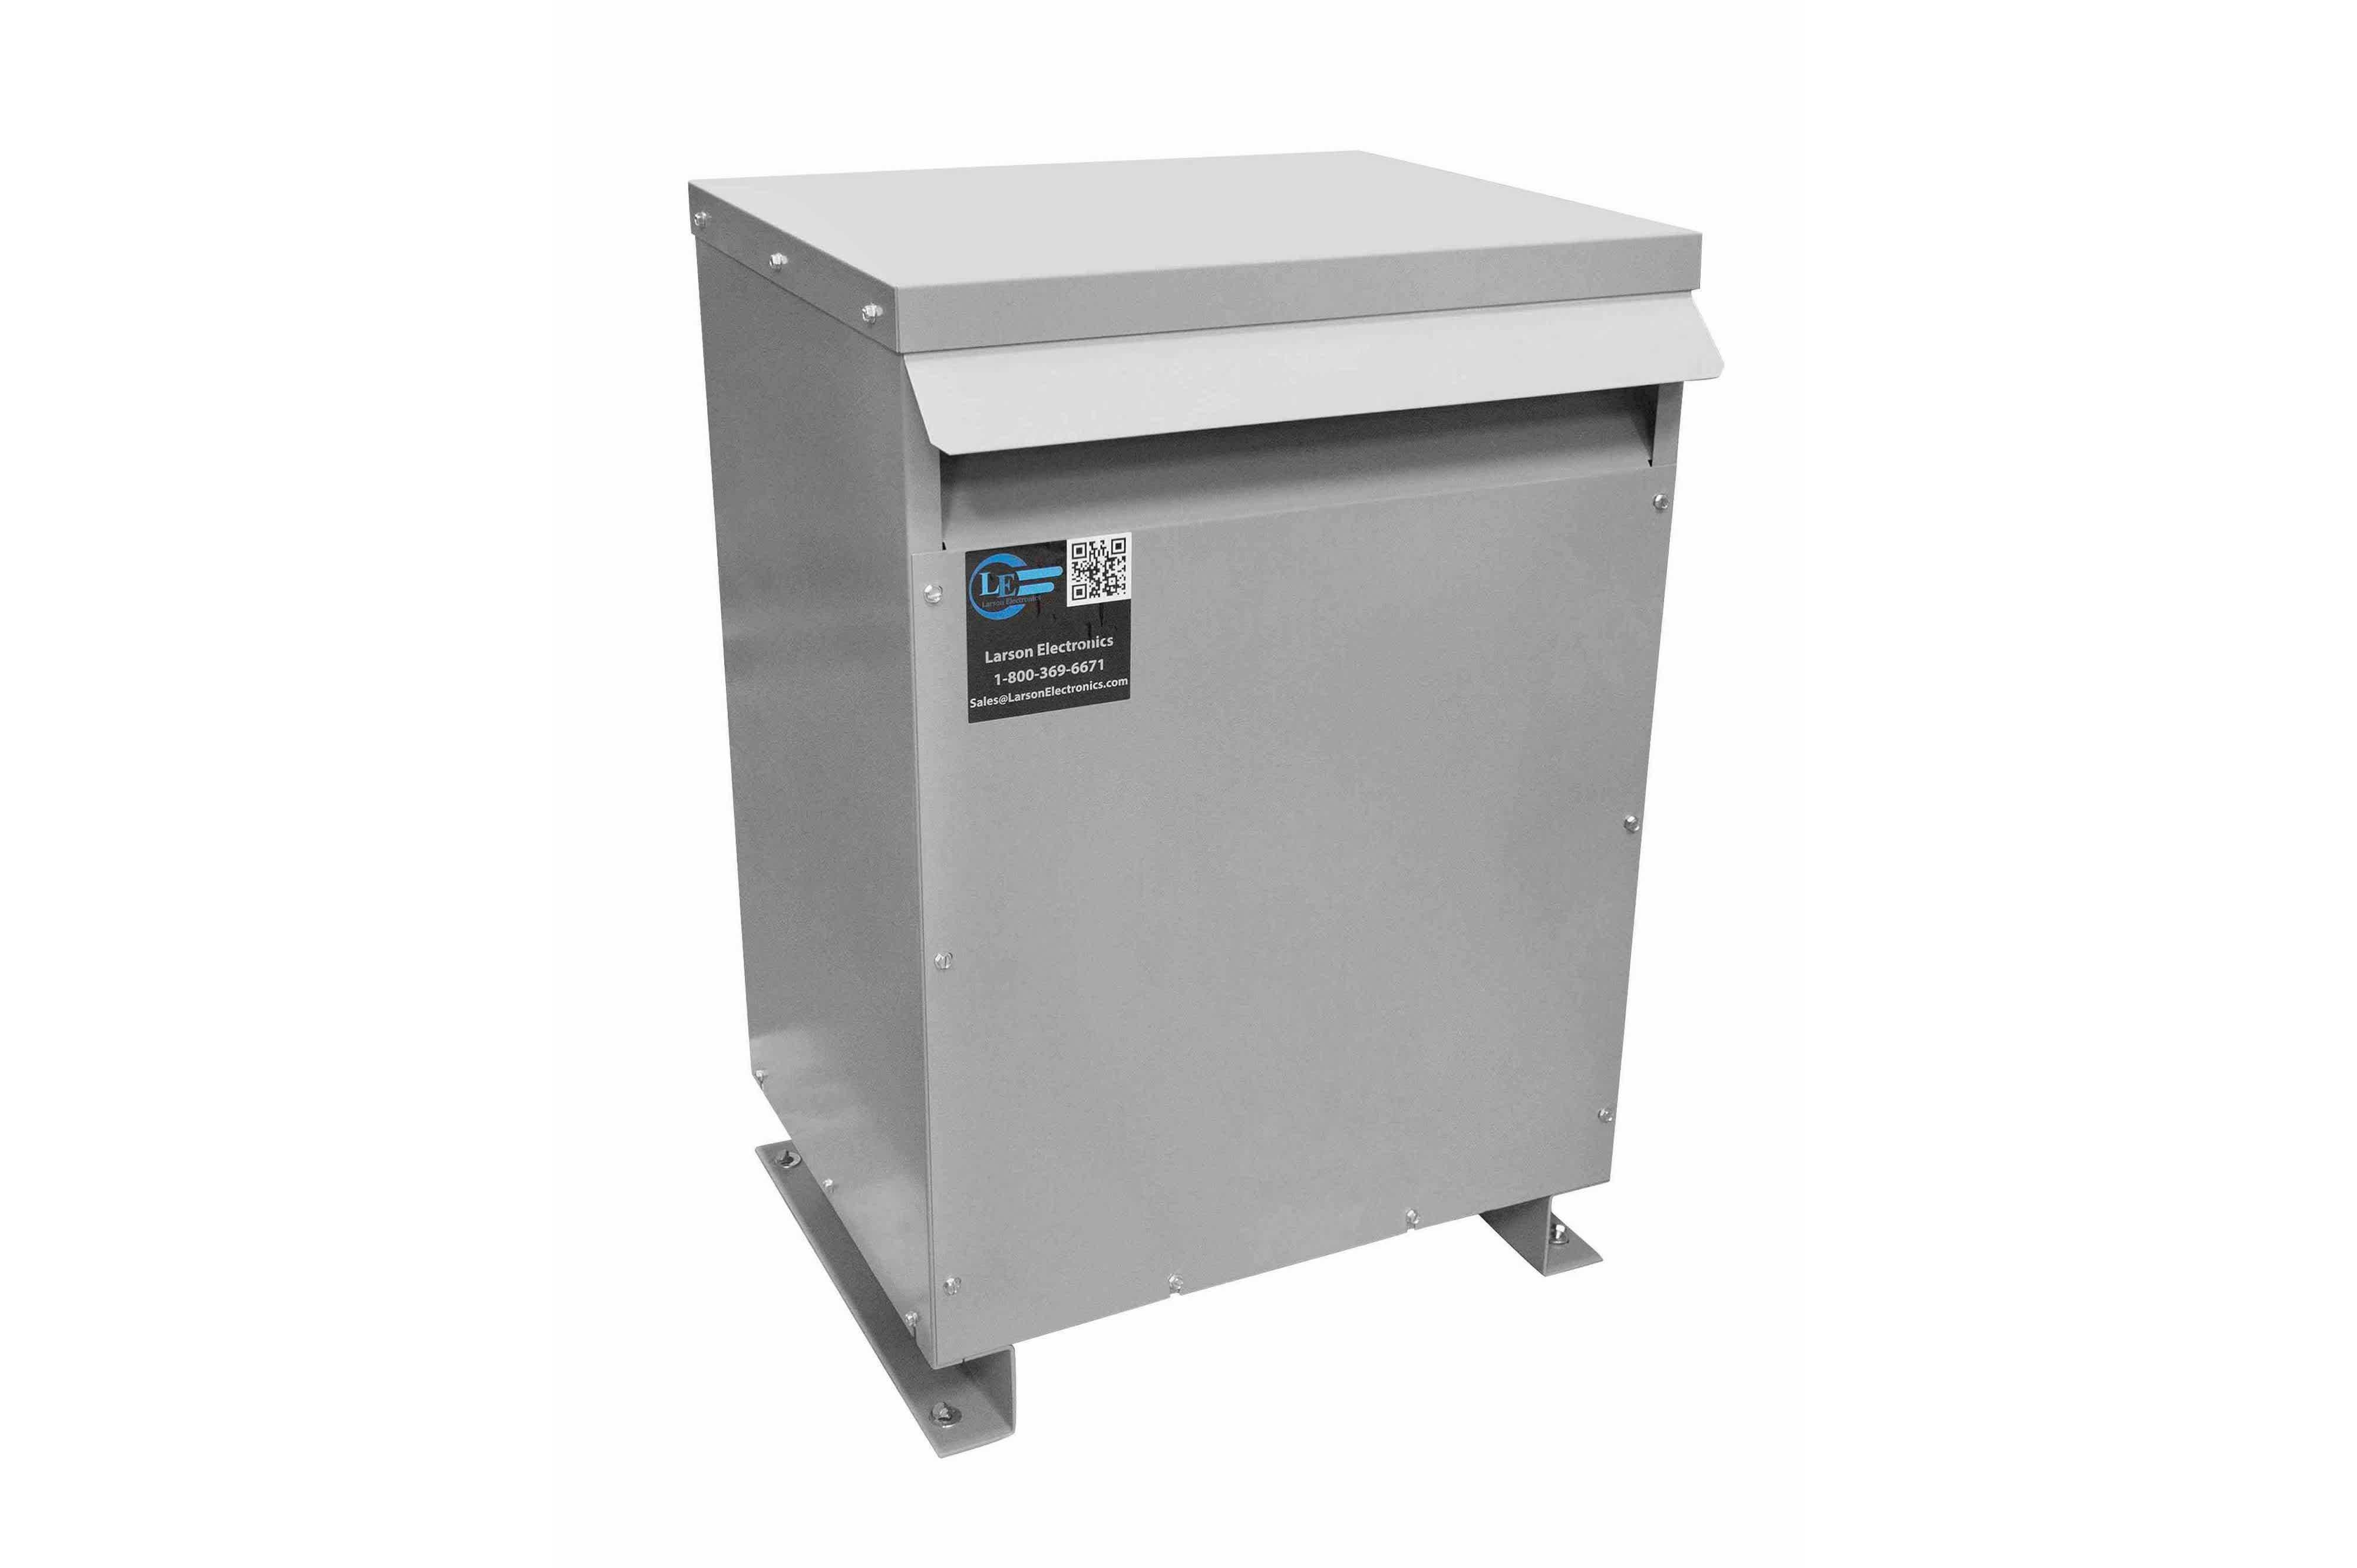 400 kVA 3PH Isolation Transformer, 400V Wye Primary, 480V Delta Secondary, N3R, Ventilated, 60 Hz